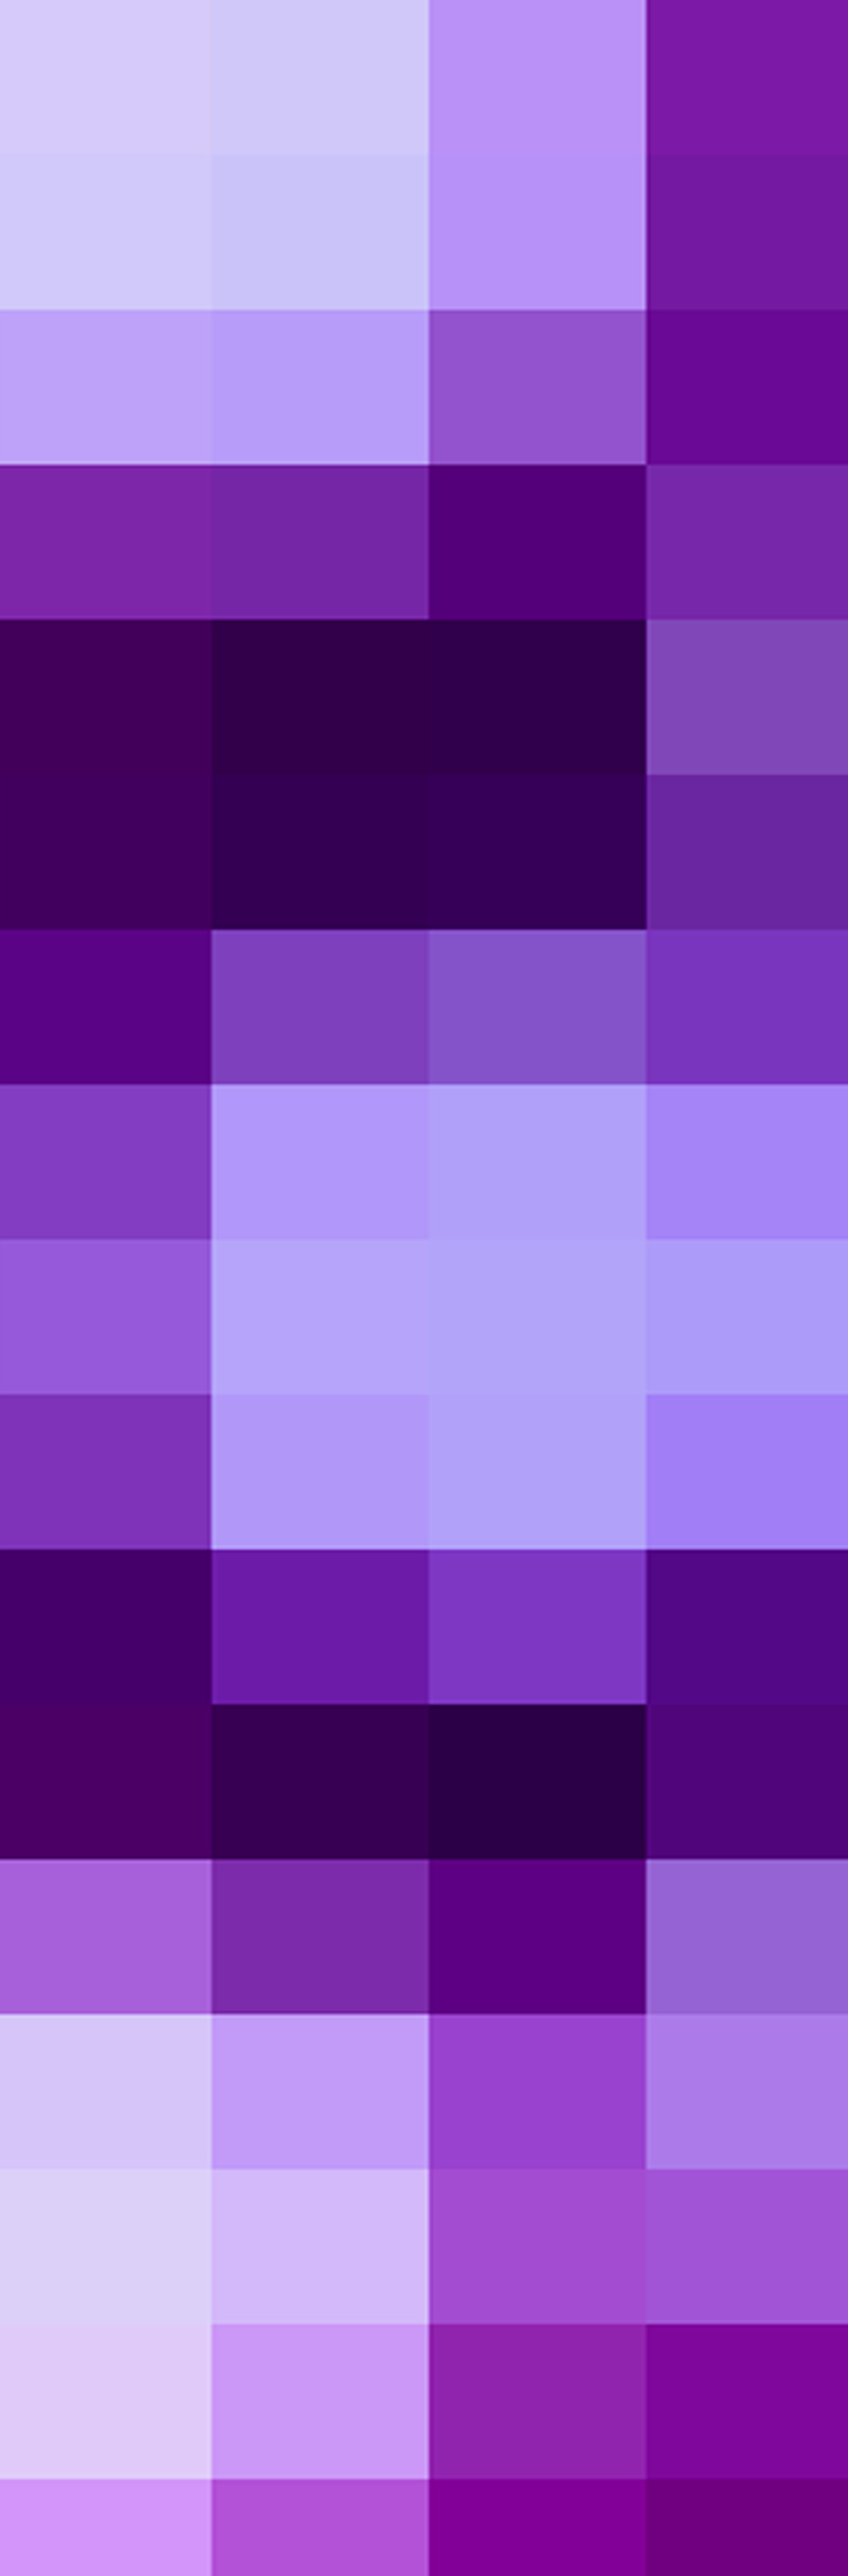 MB Pixel 6-120